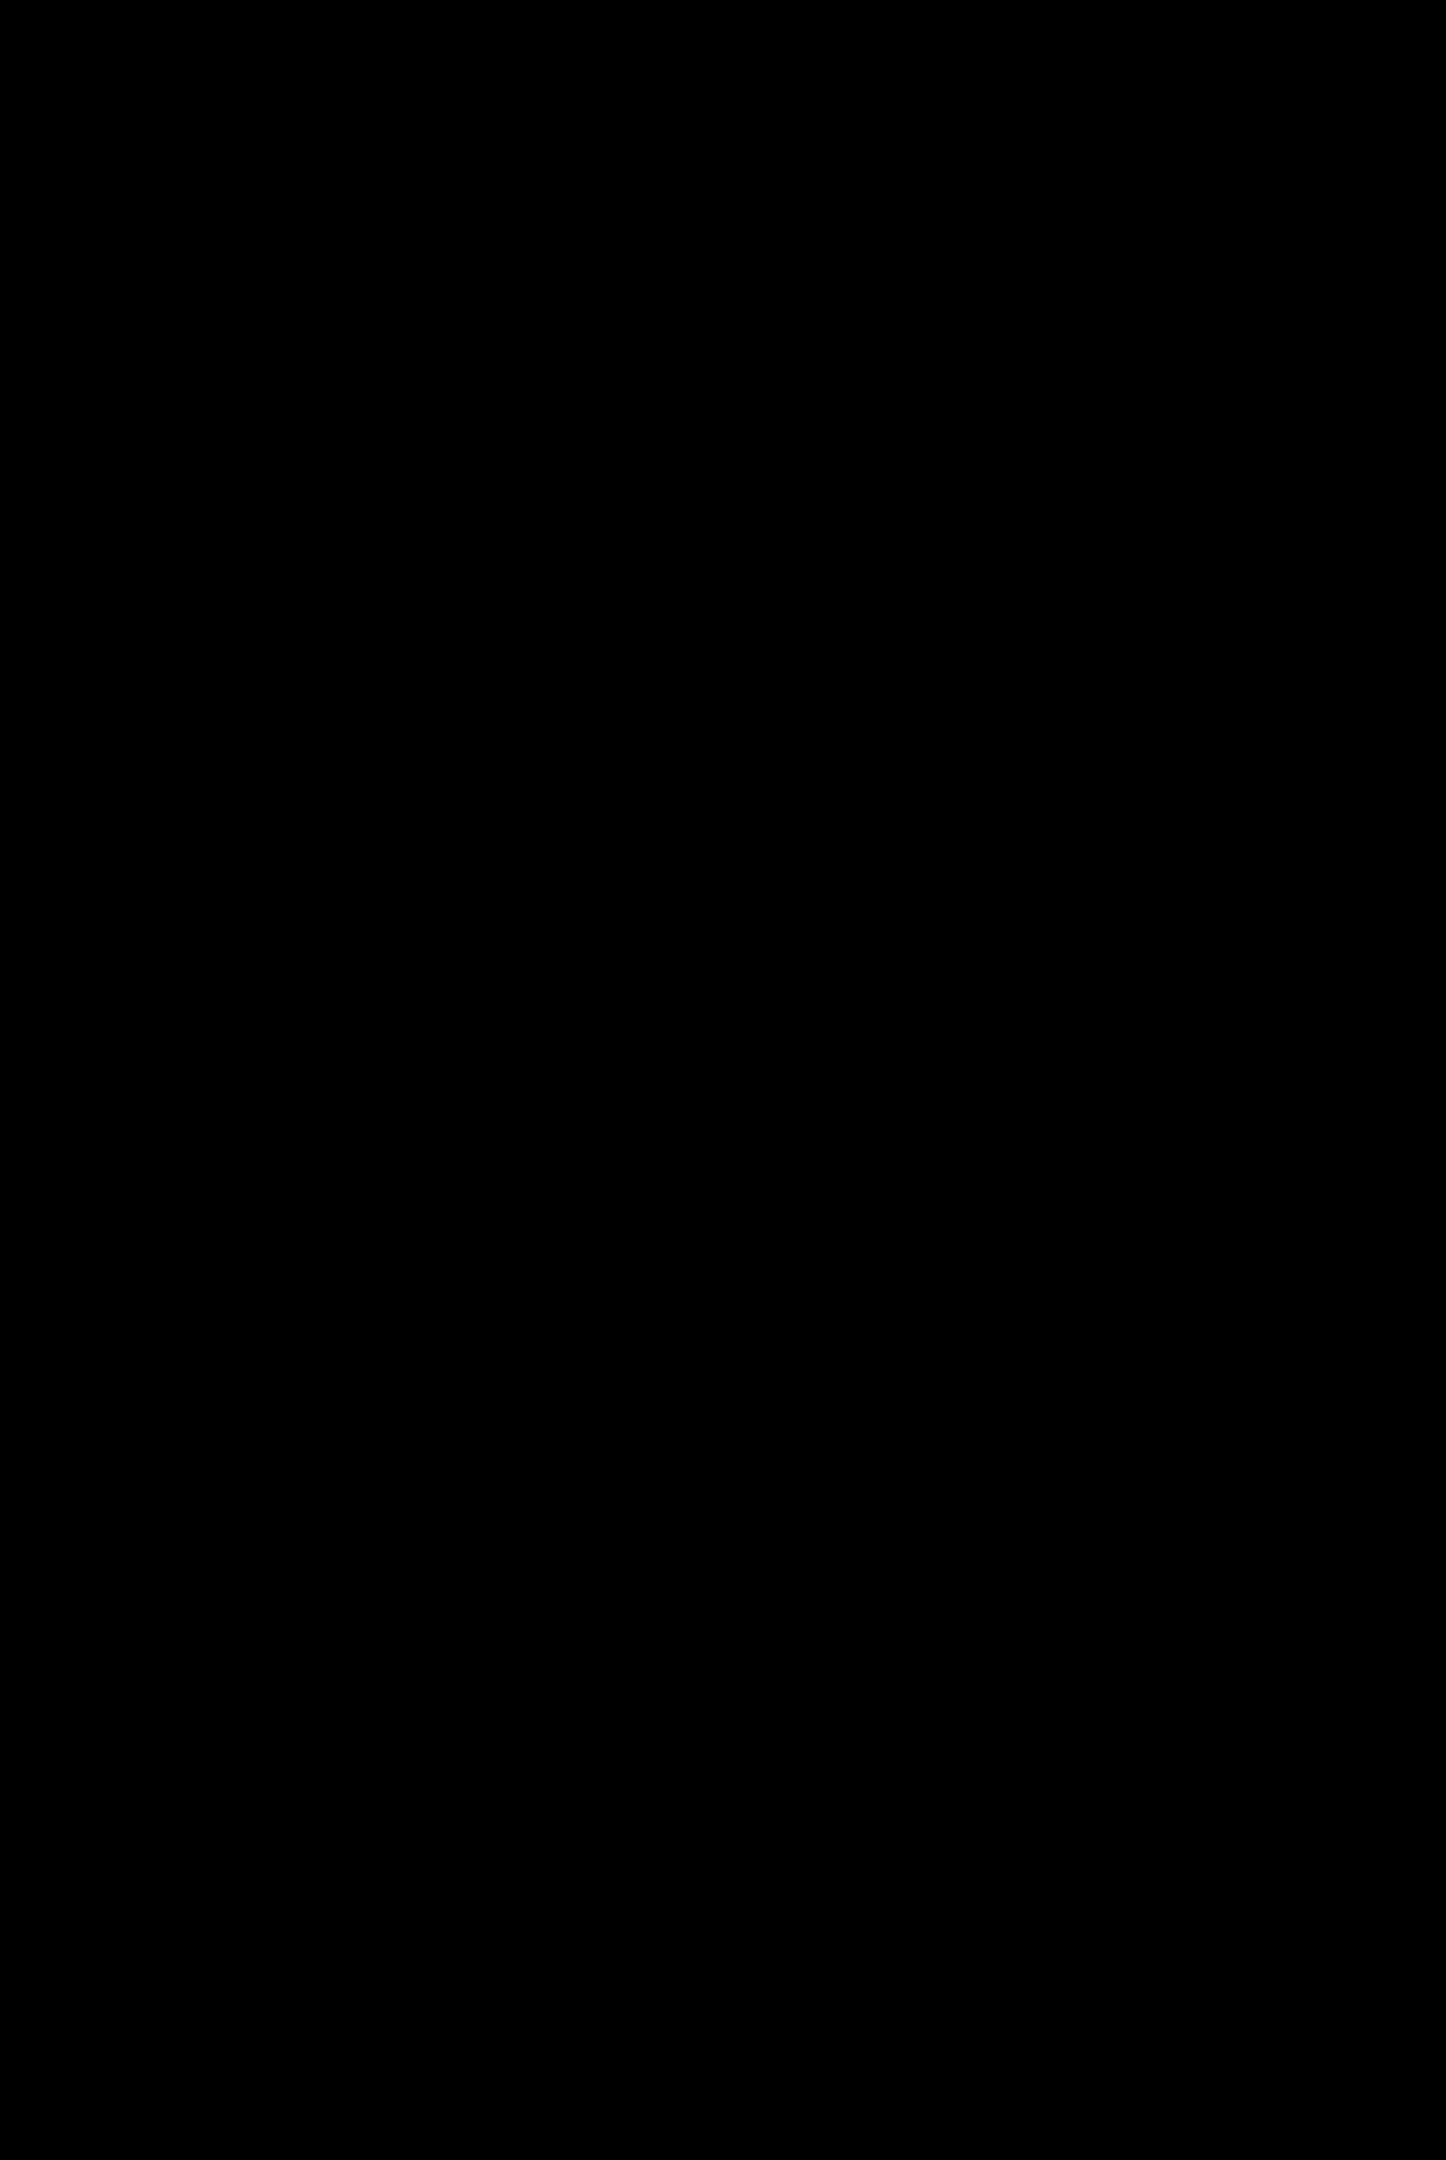 Big image png. Clipart rocket drawing